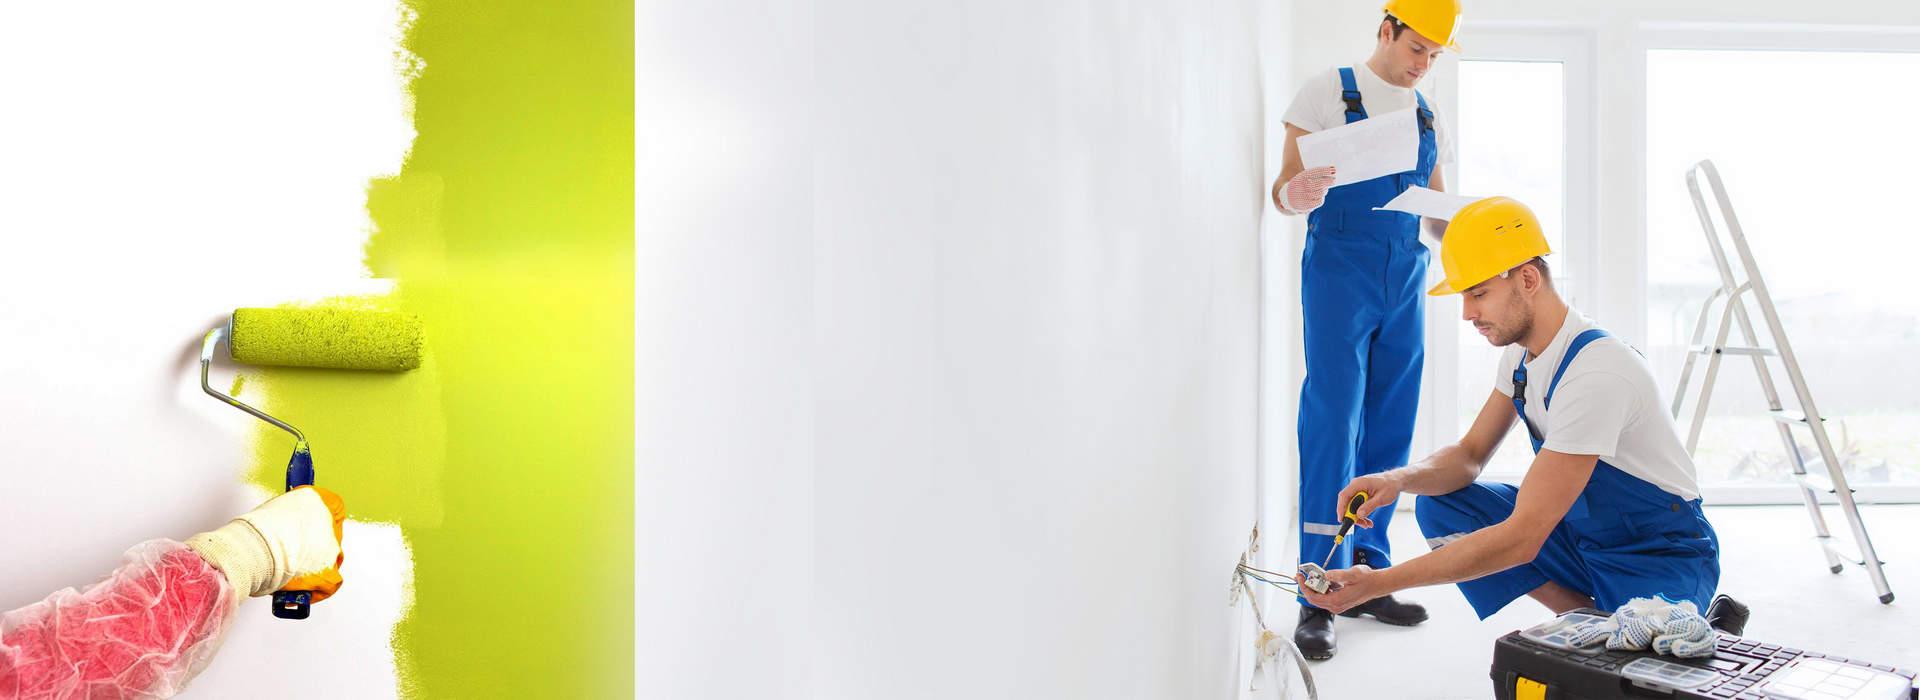 ремонт квартир картинки для загрузки гамак